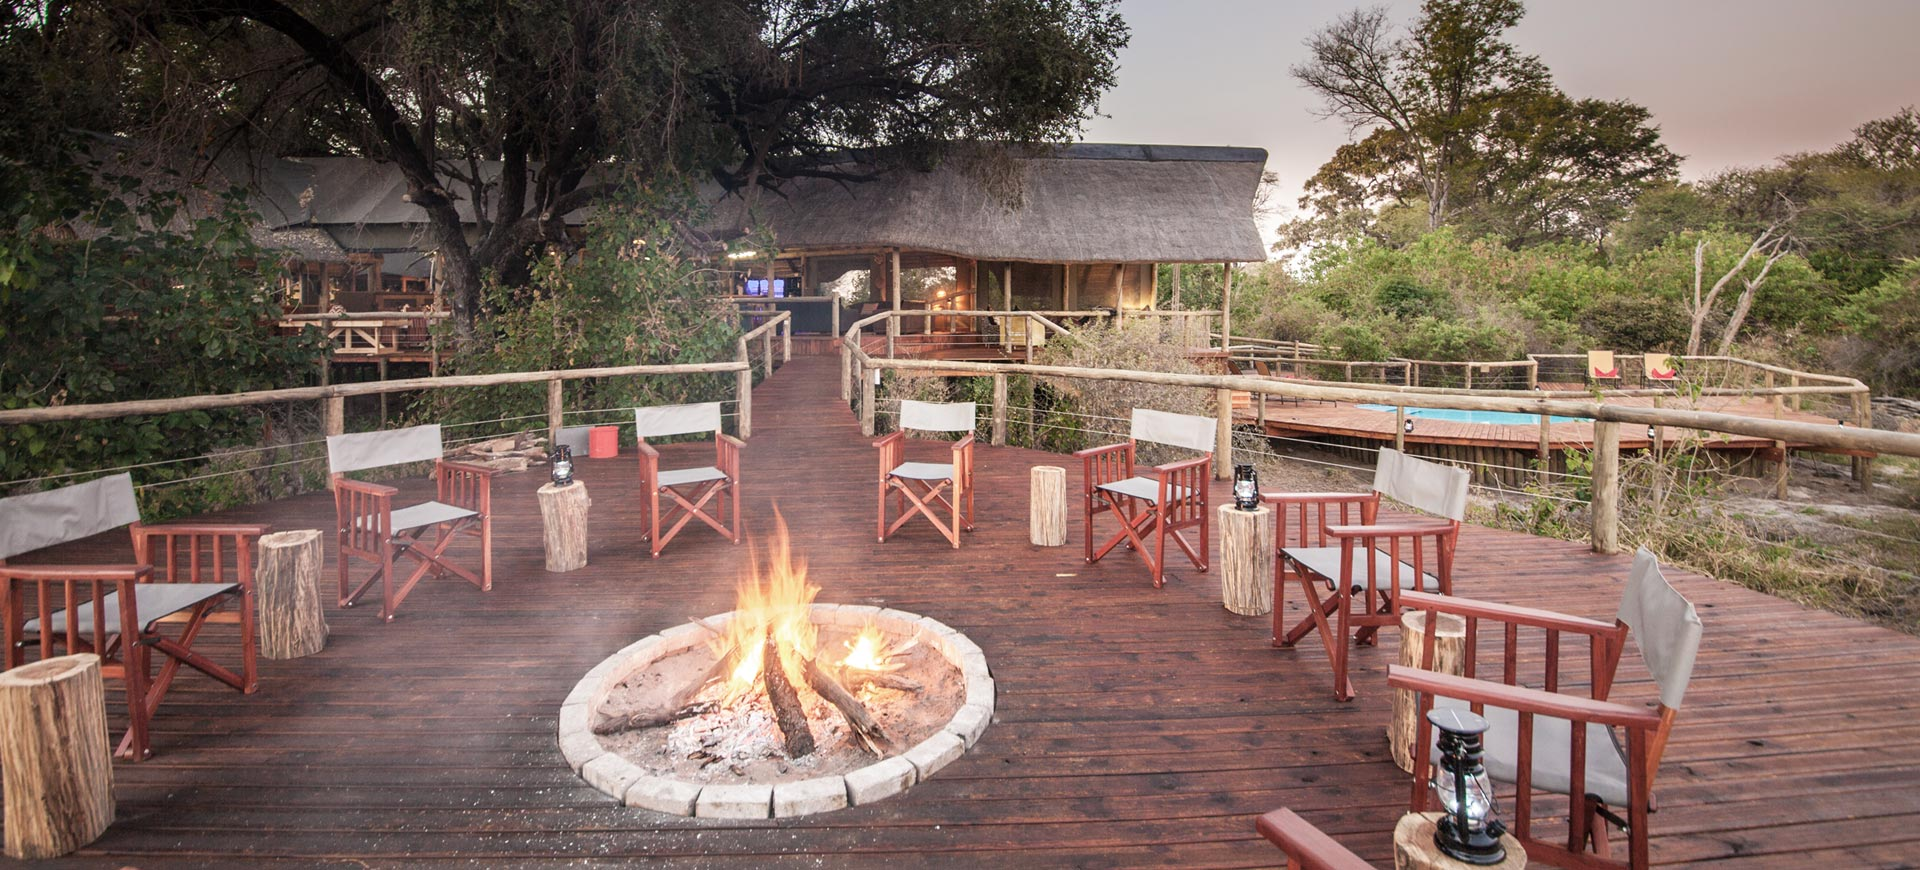 Camp Rra Dinare Okavango Delta